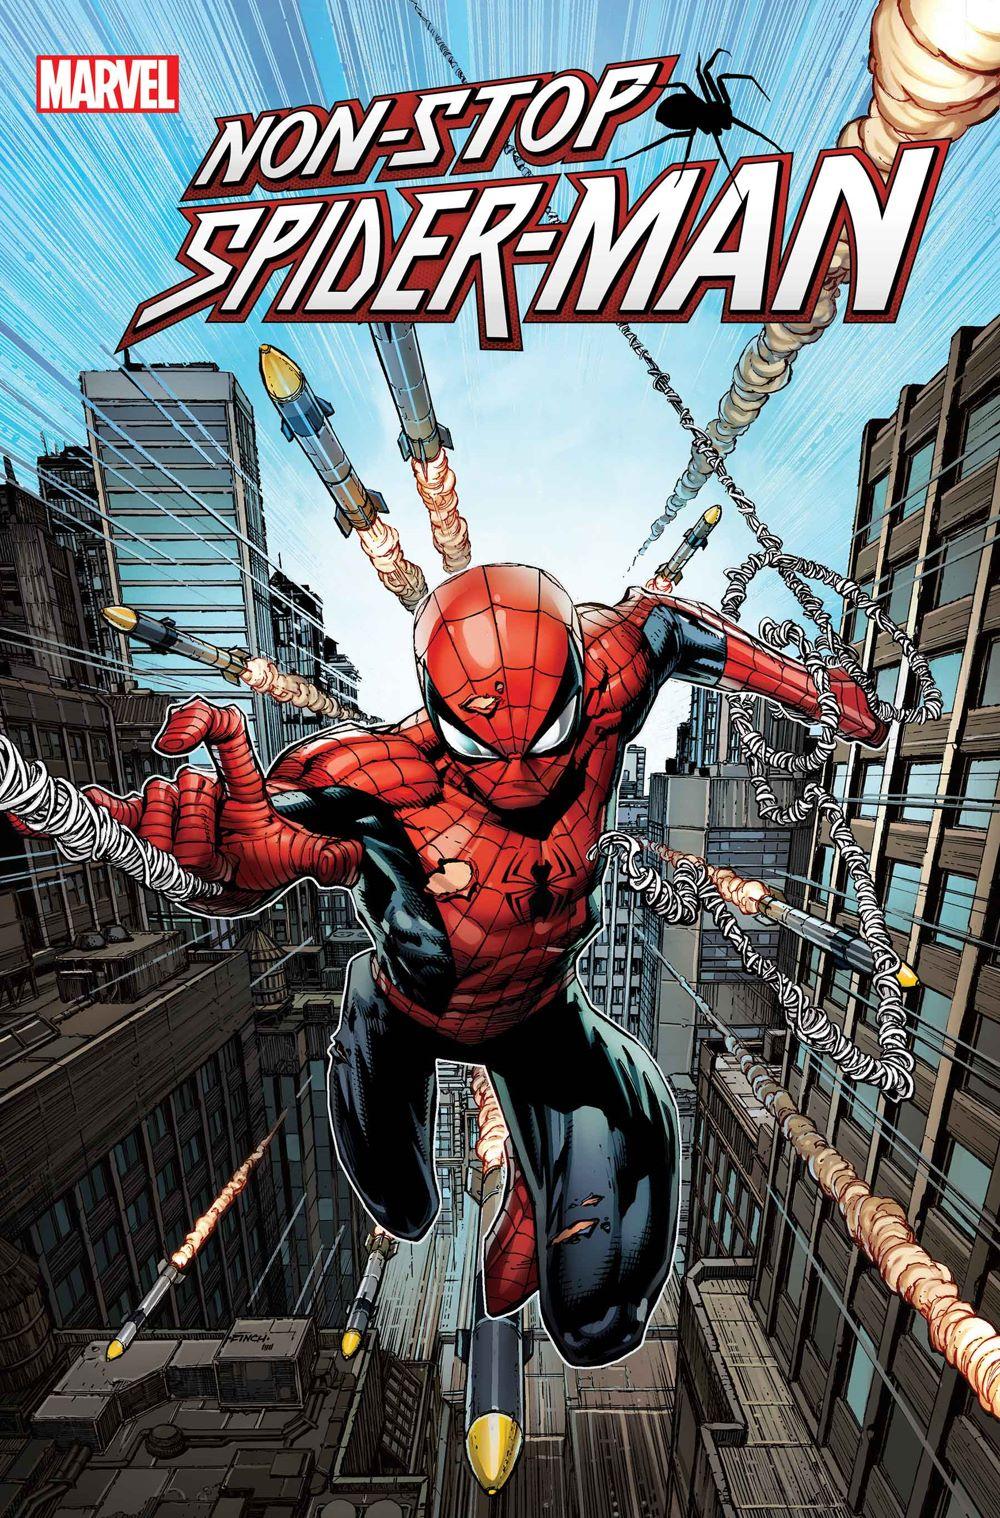 NONSTOPSM2020001_finch Marvel Comics January 2021 Solicitations